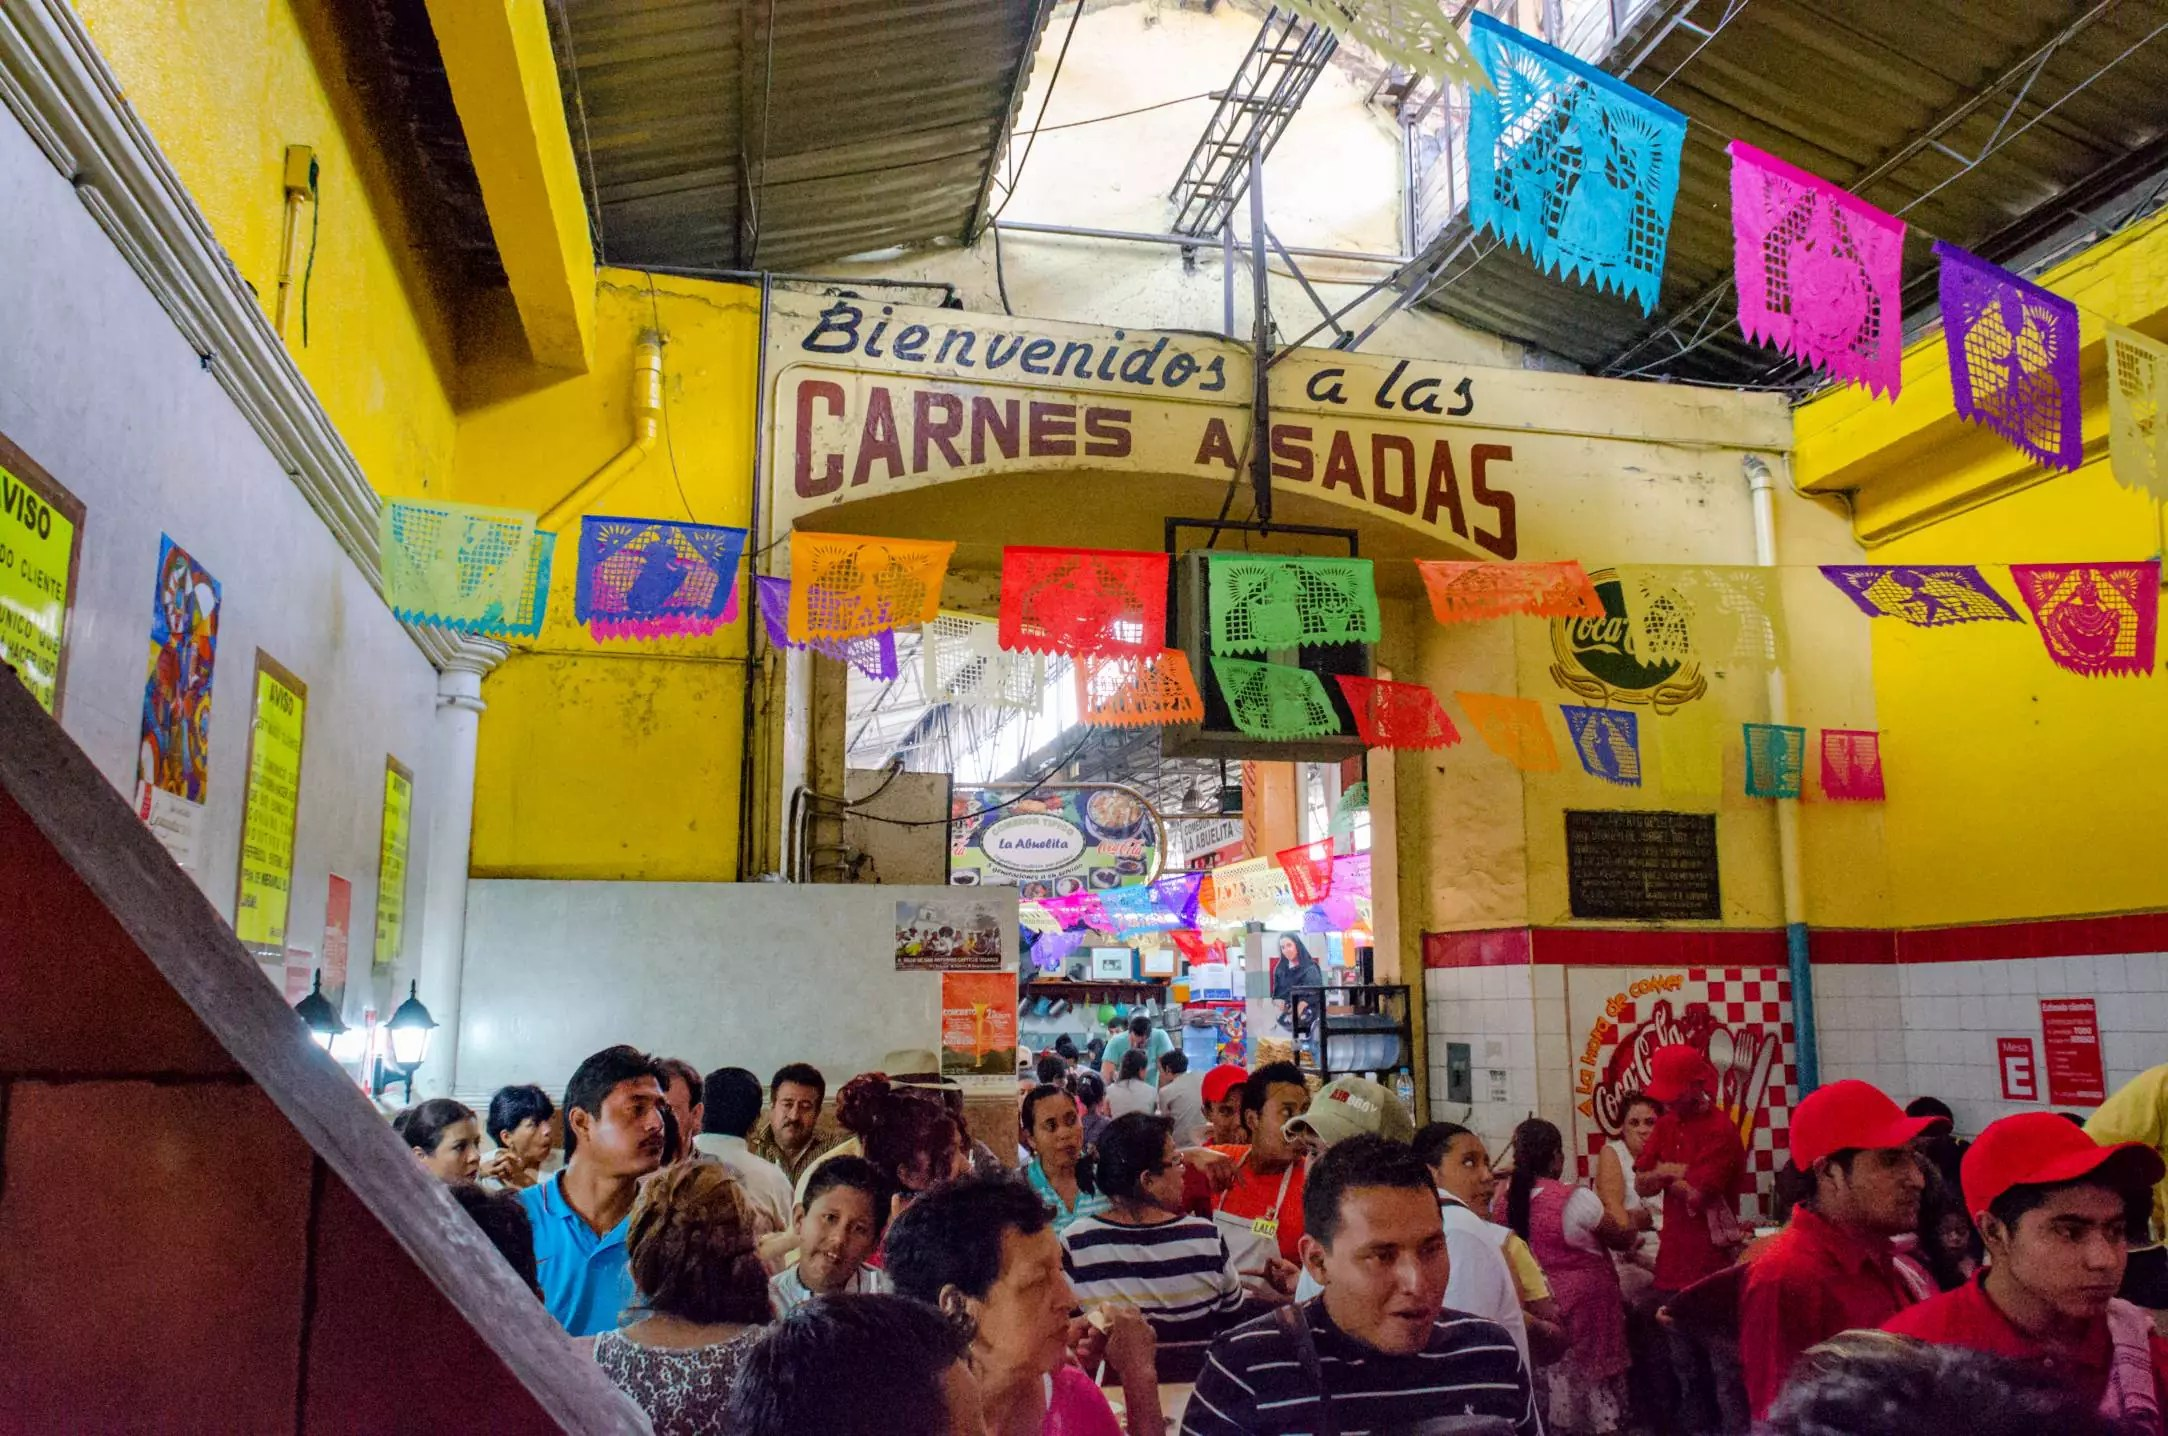 What to eat in Oaxaca City - Carnes Asadas - Things to Do in Oaxaca